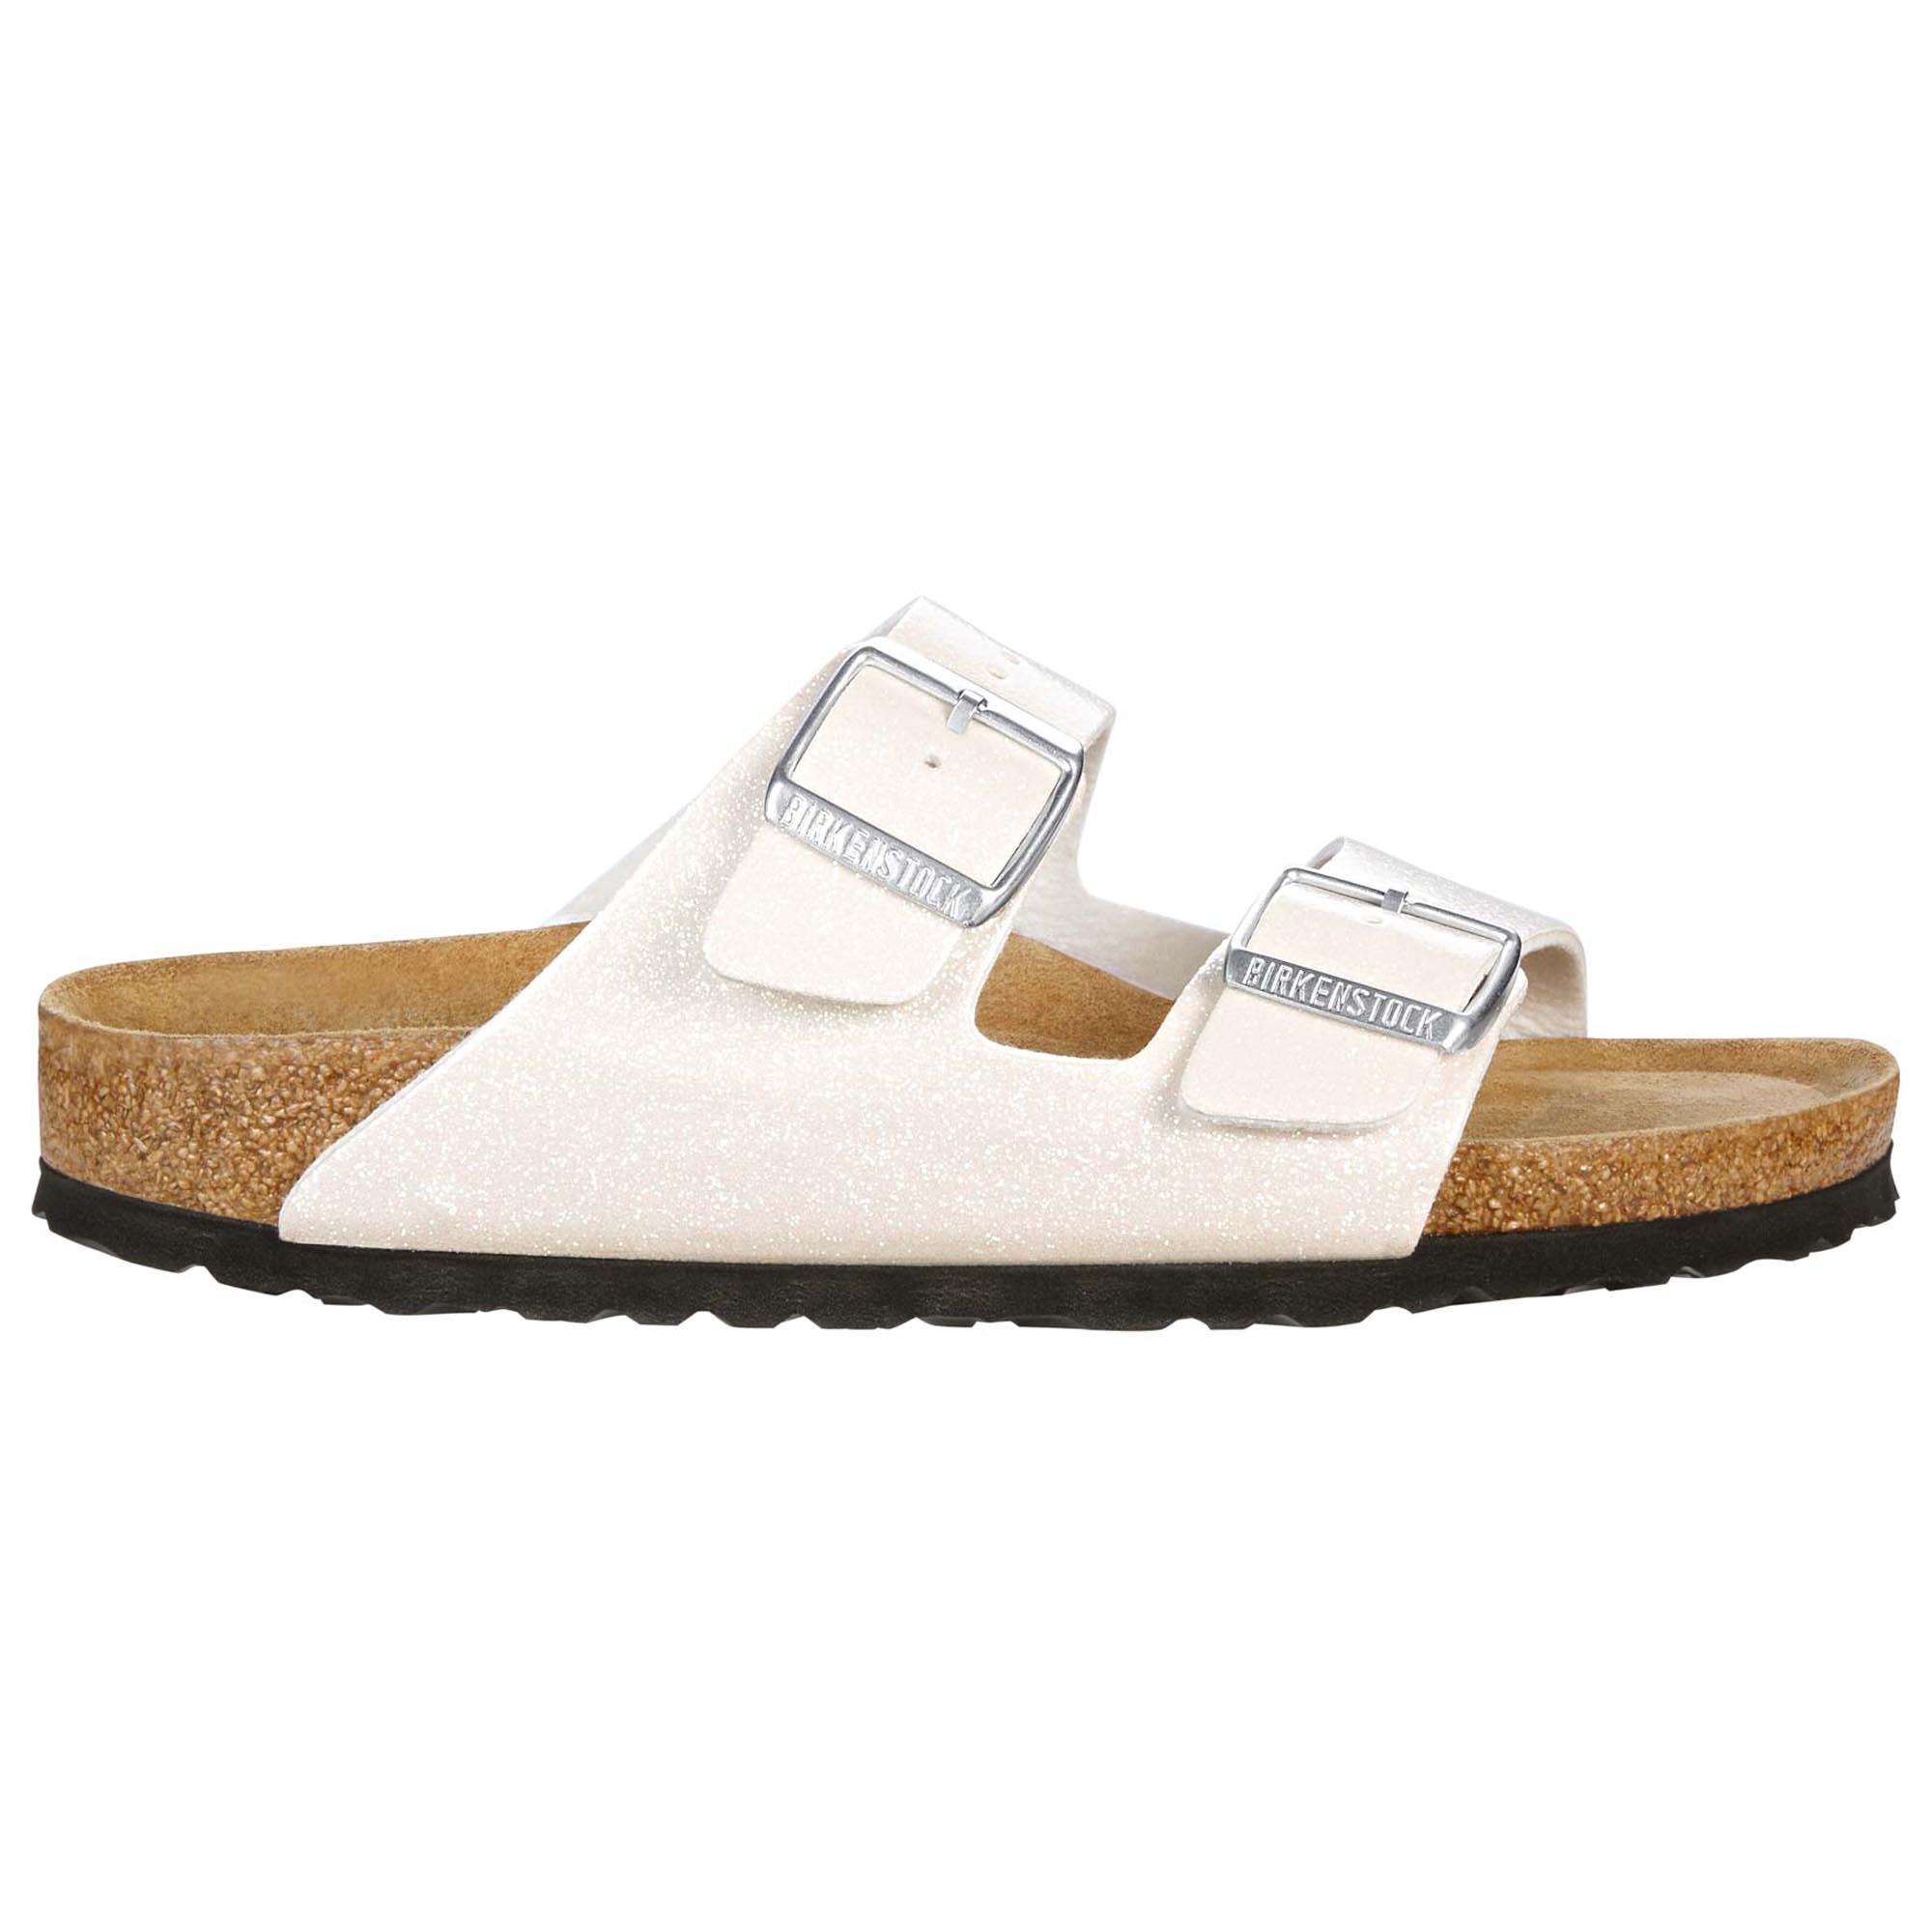 Birkenstock Arizona Soft Footbed Birko Flor Womens Sandals jHB0WMd